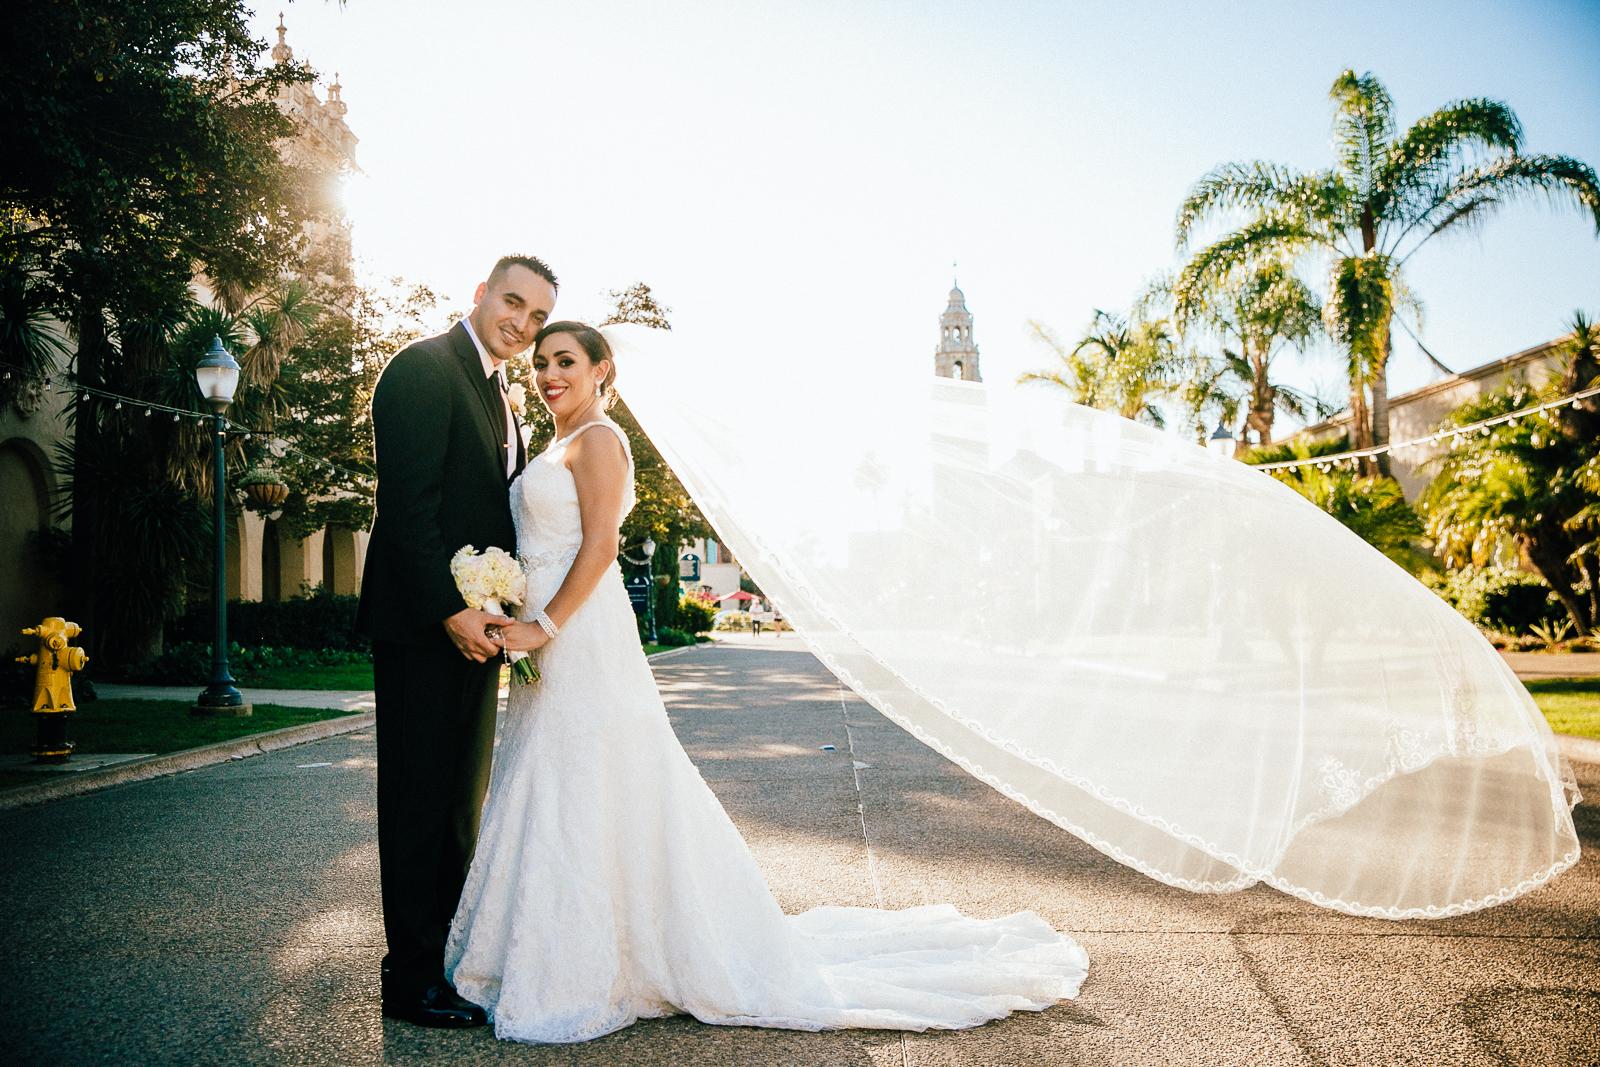 ANGELINE_&_JESUS_WEDDING_LAFAYETTE_HOTEL_2015_2015_IMG_3422.JPG